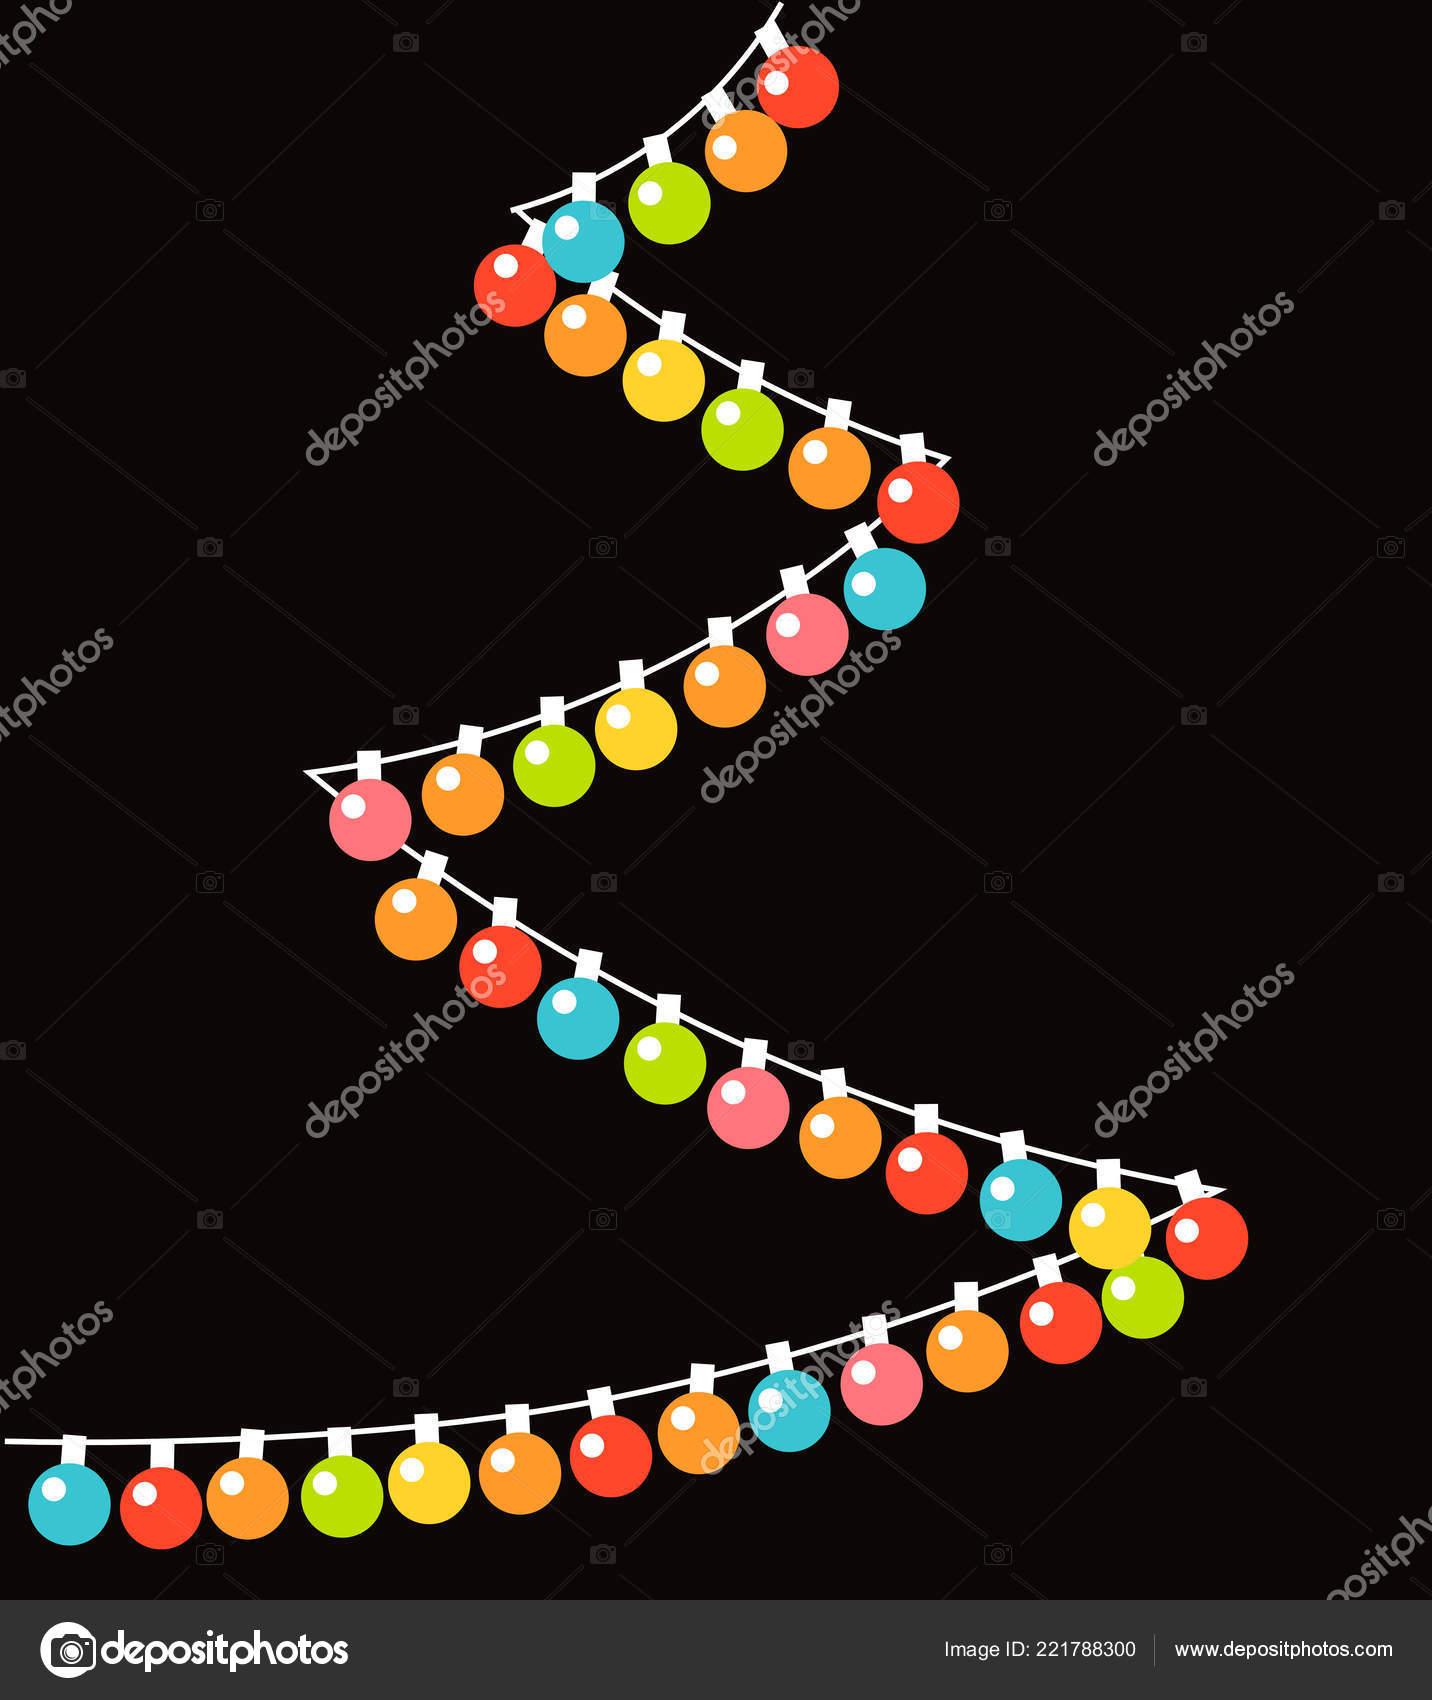 Colorful Christmas Tree Vector.Colorful Christmas Baubles Lights String Christmas Tree